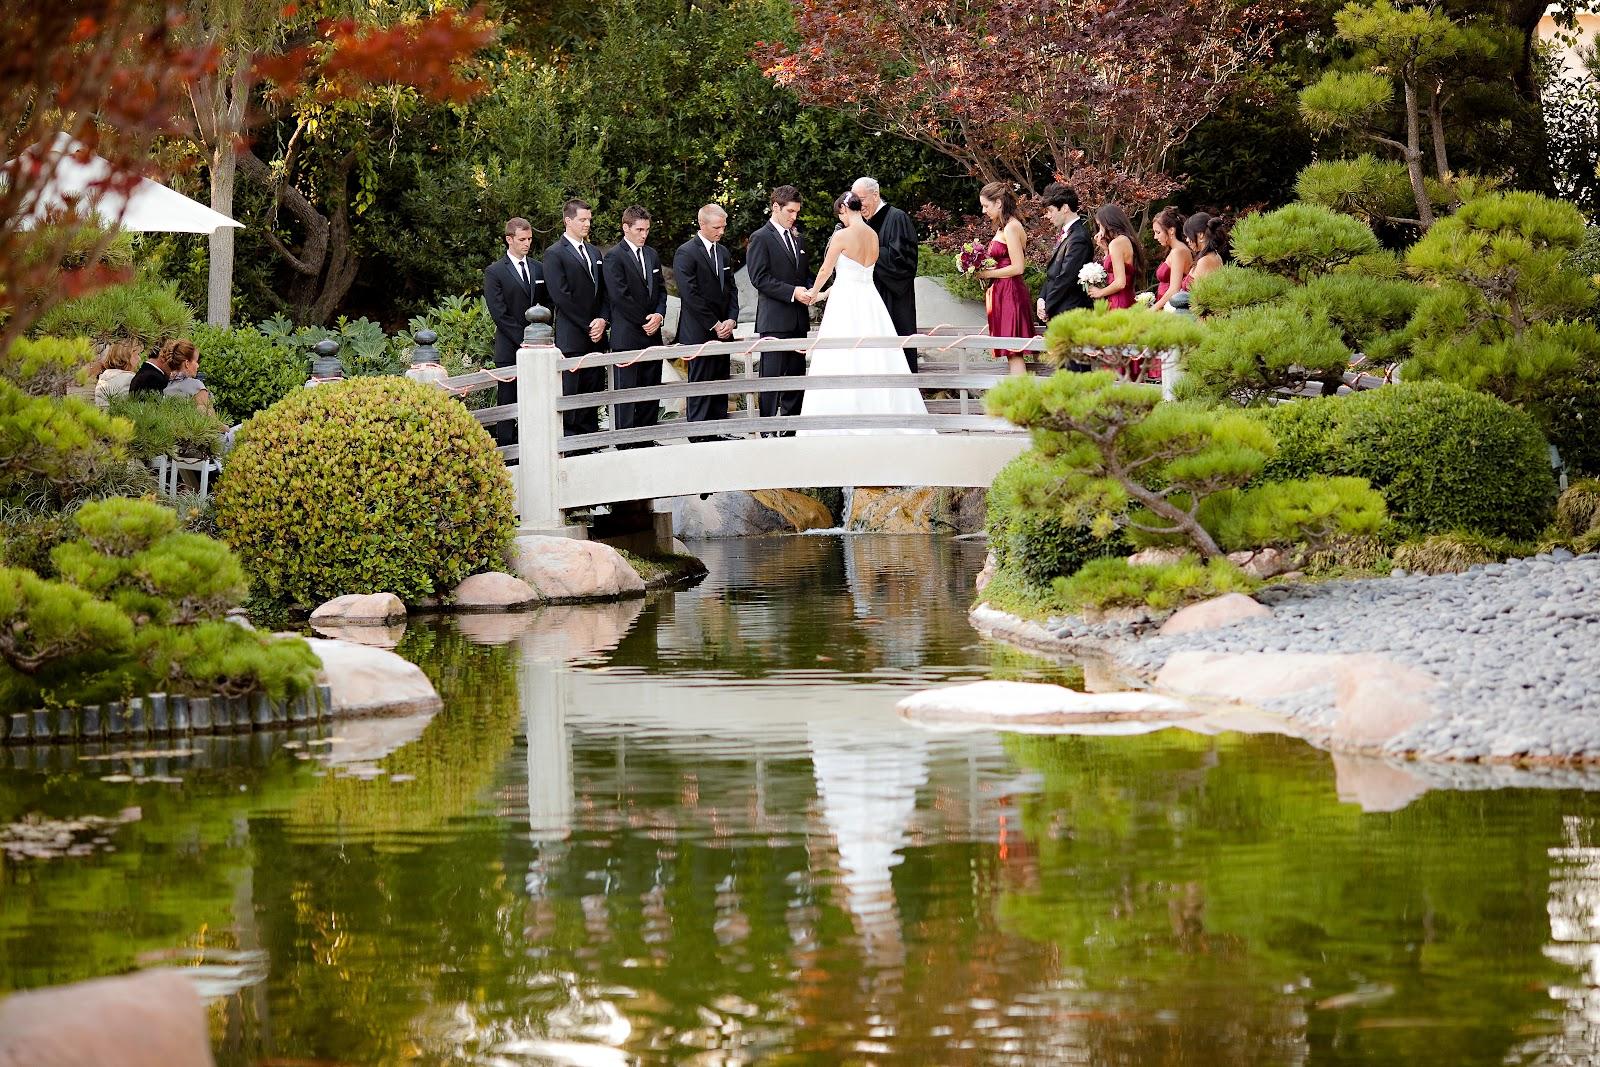 Puteri buana garden wedding